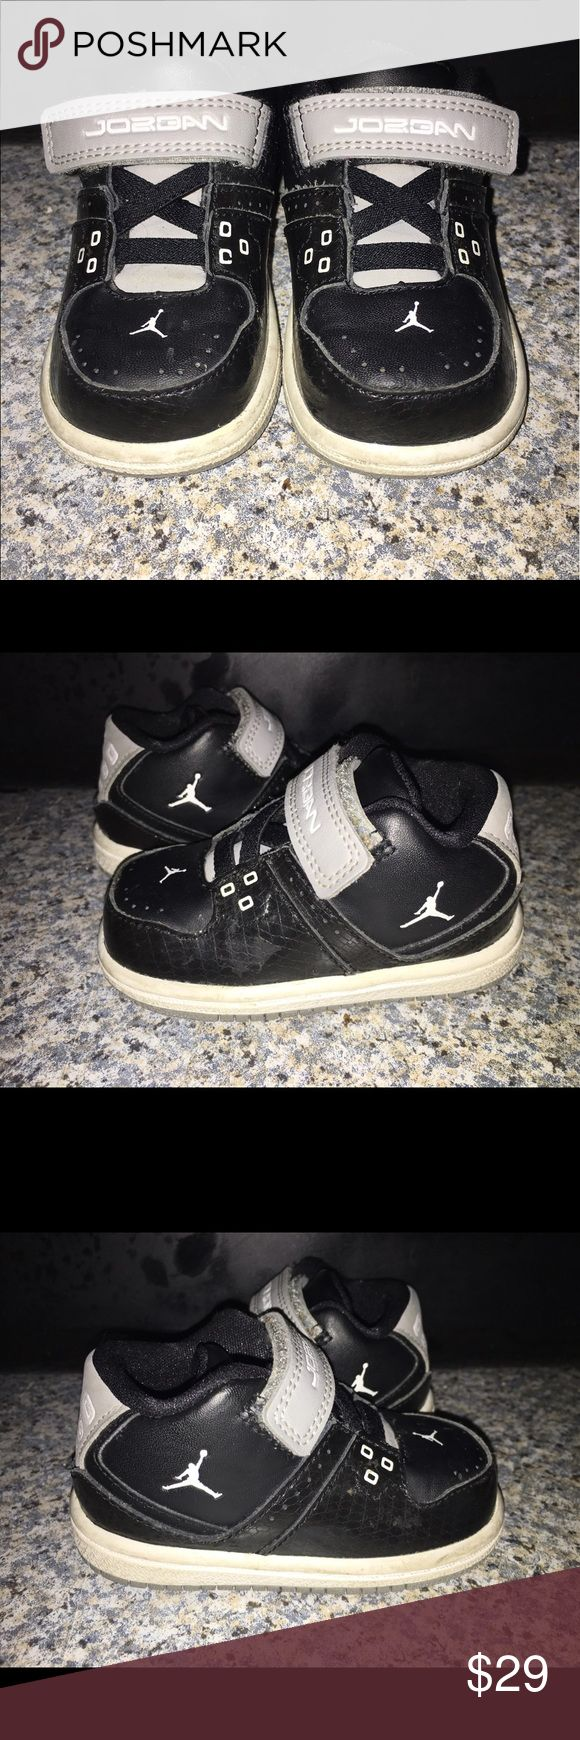 Nikes Toddler Jordan 1 Flight Low, Size 4C Air Jordan Retro Black & White Shoes with Gray Velcro closure. Size Toddler 4C Great Condition!!   Great condition!! Air Jordan Shoes Sneakers